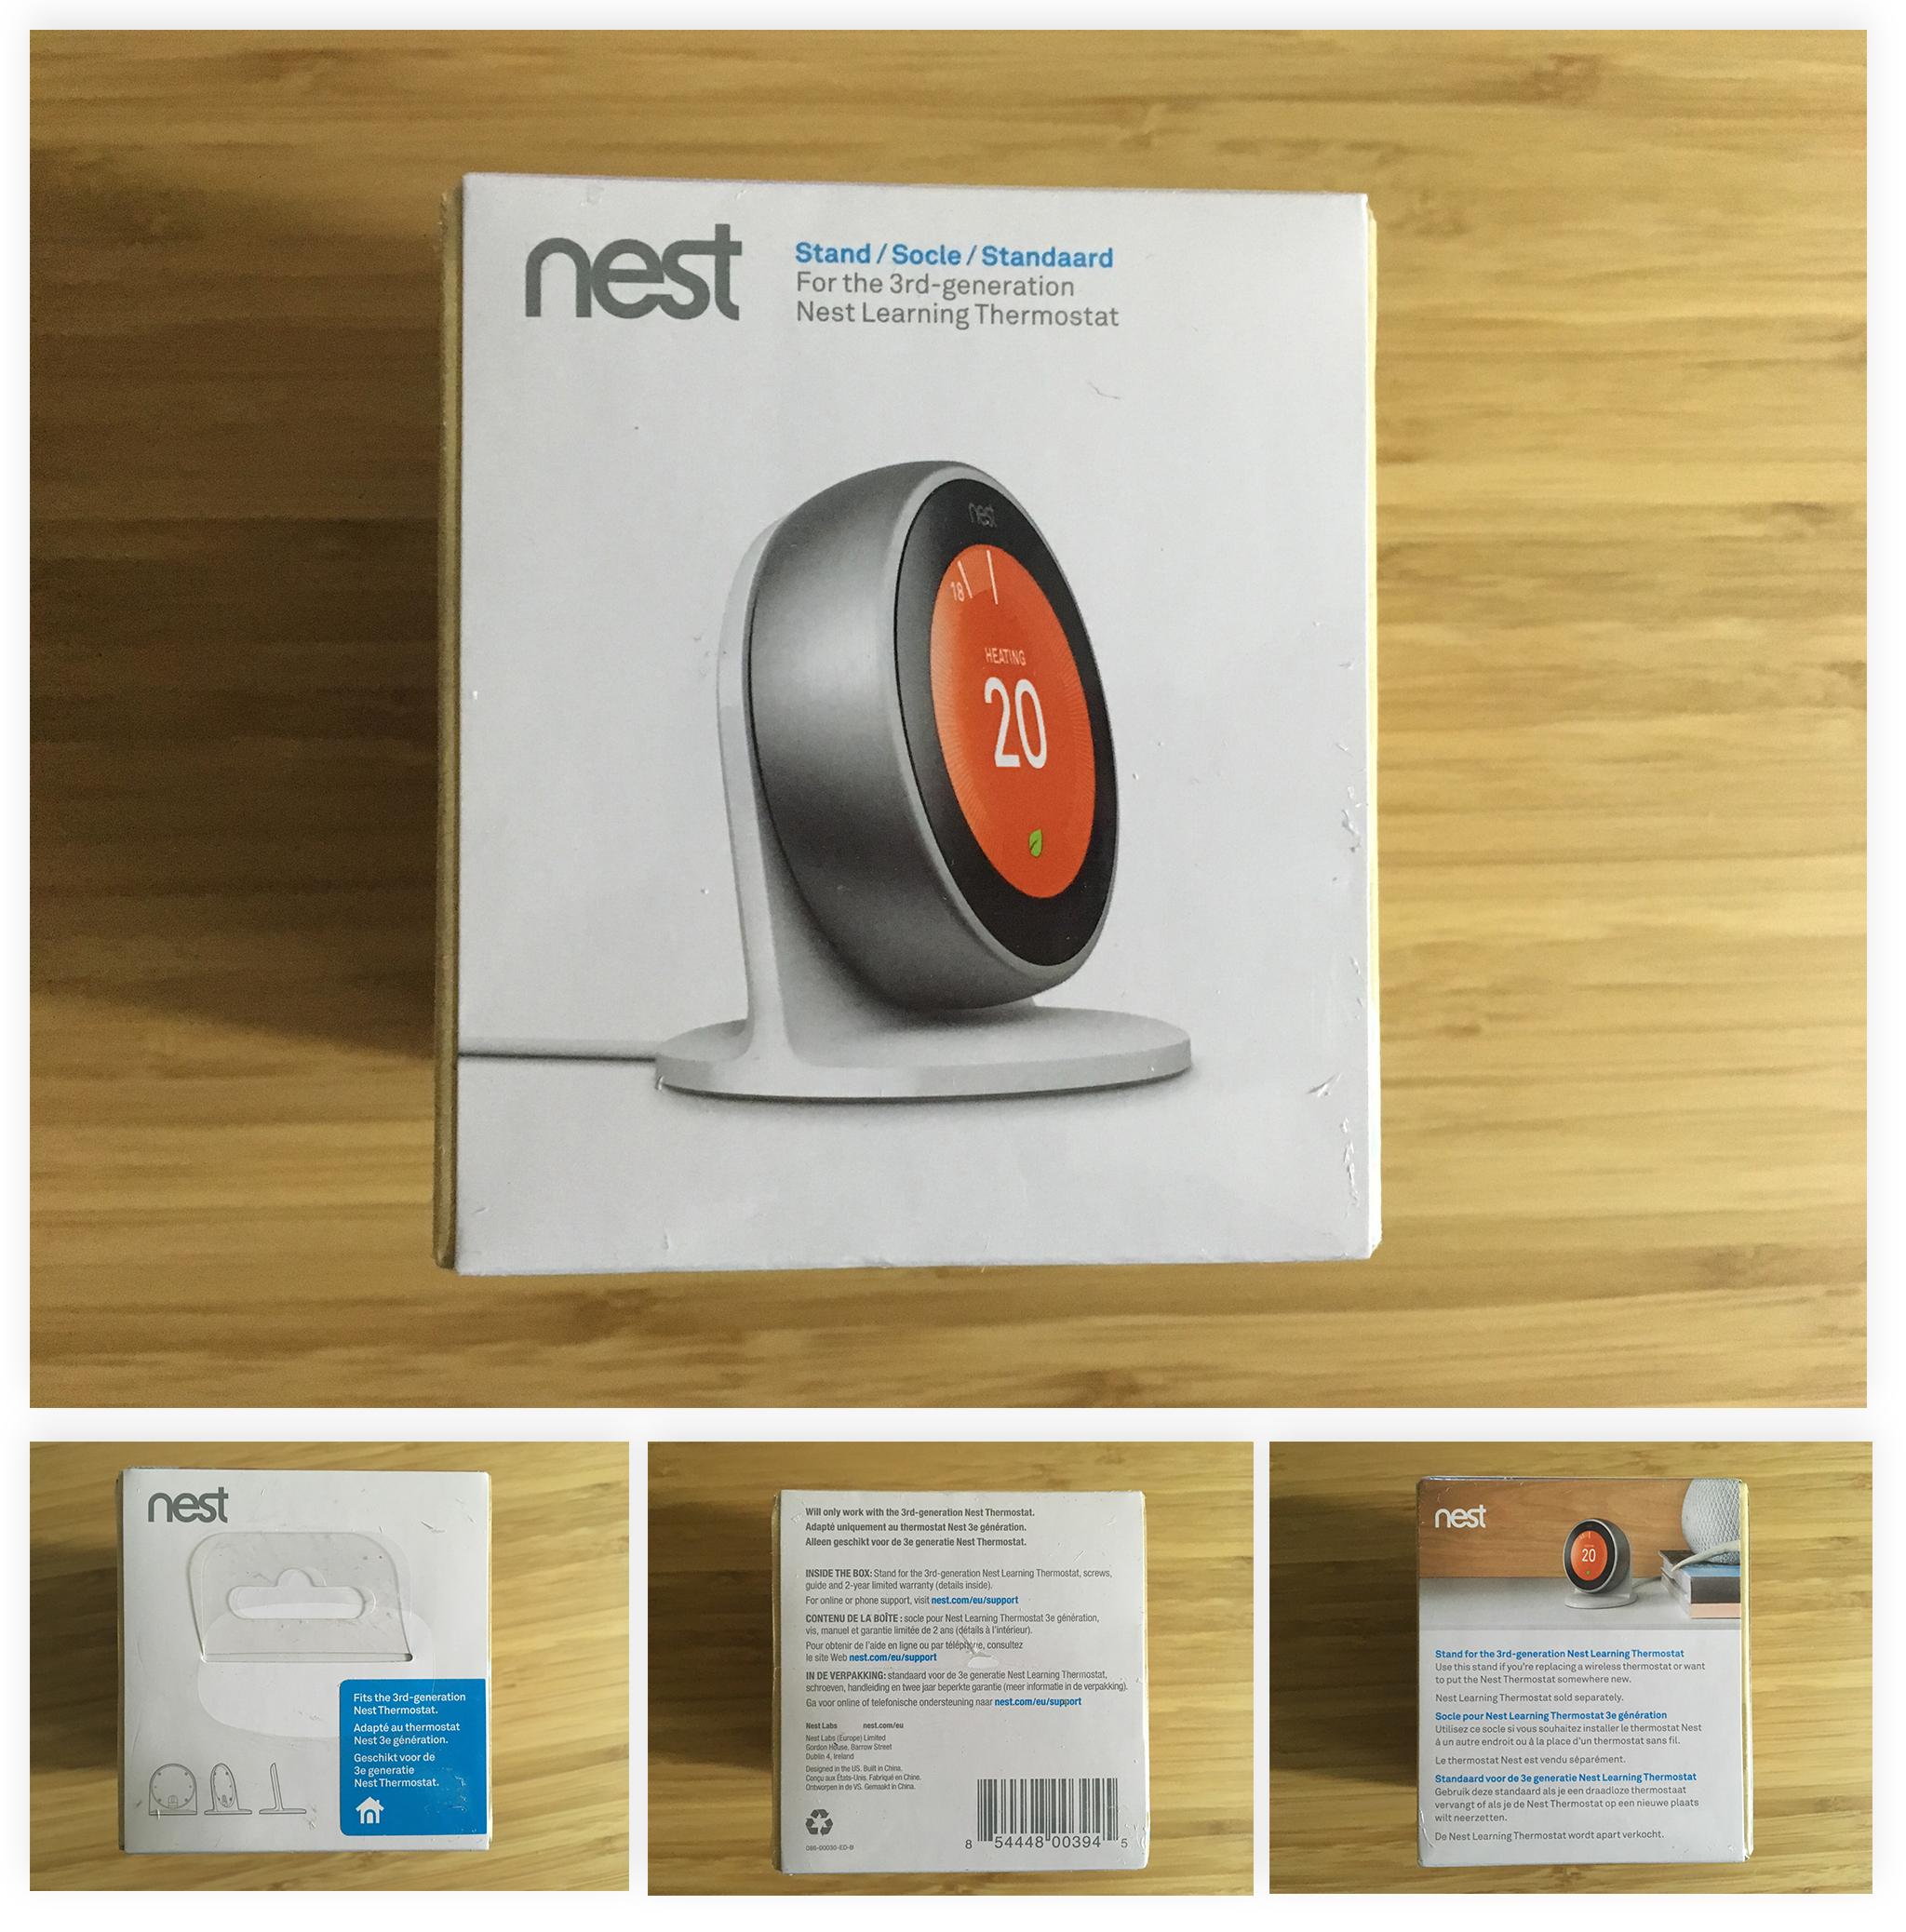 nest-holder-box-sum1